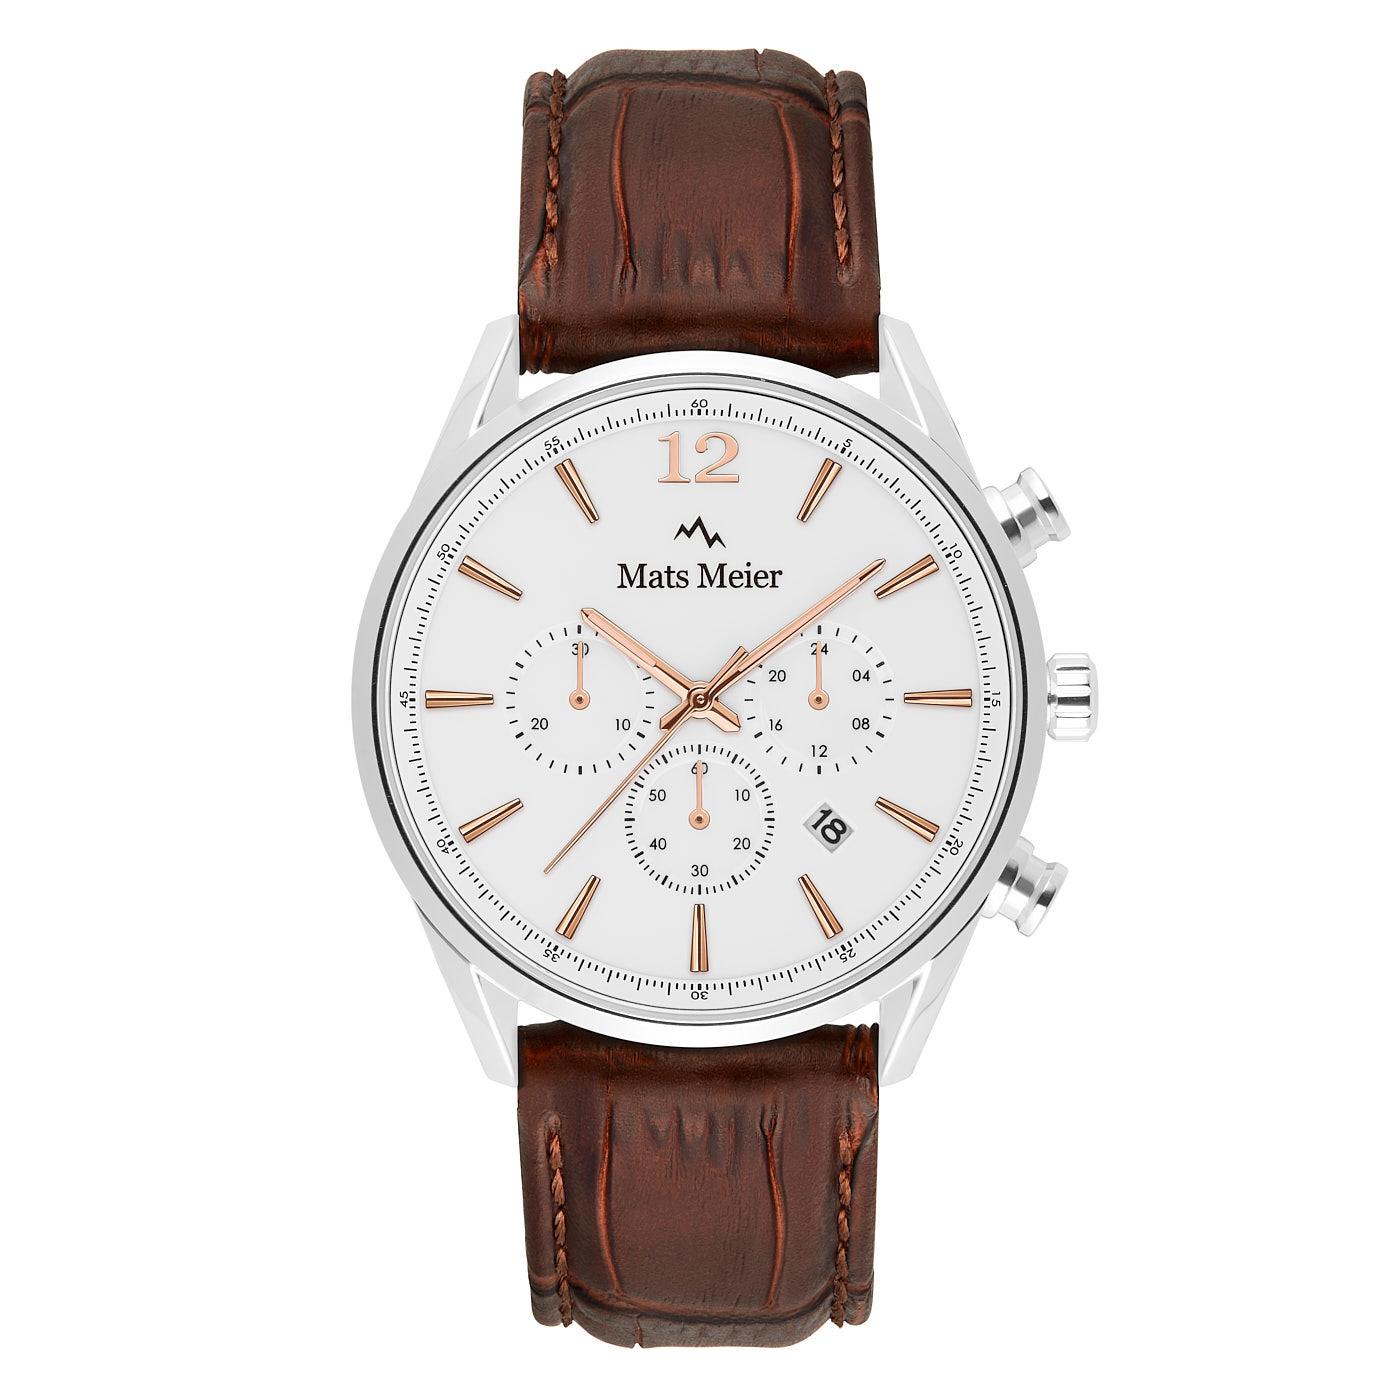 Mats Meier Grand Cornier chronograaf horloge wit/bruin